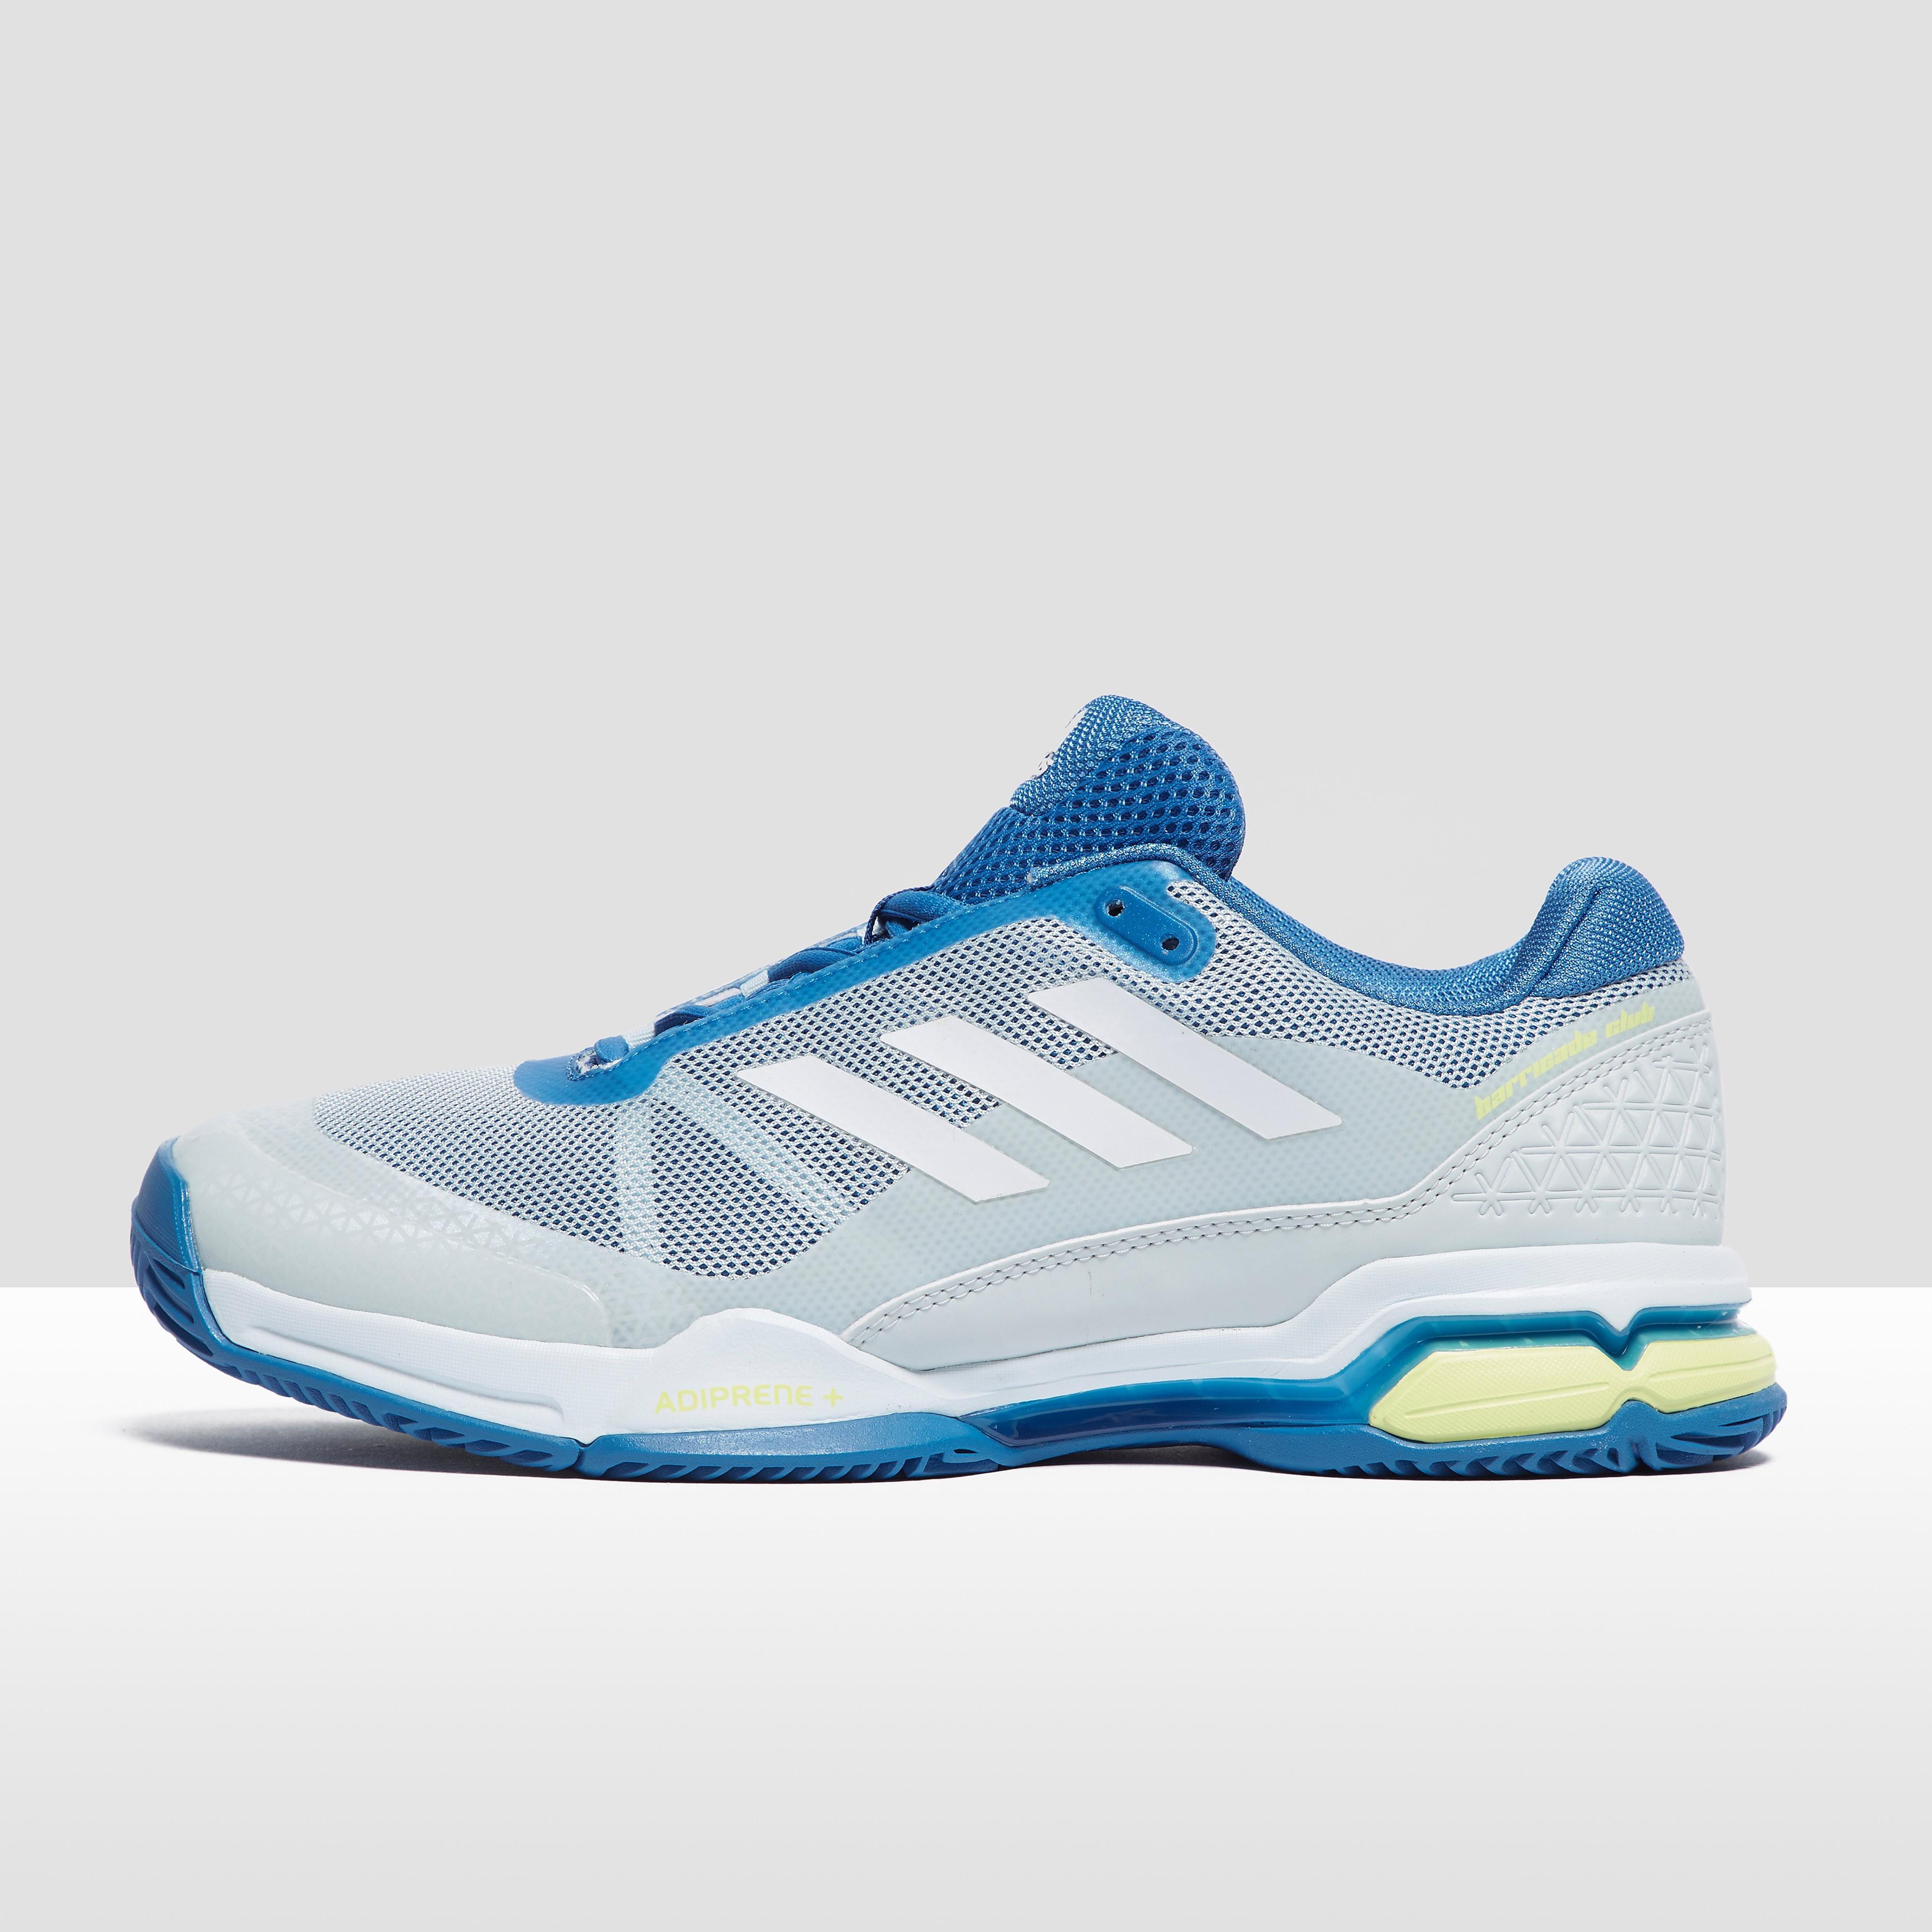 adidas Barricade Men's Tennis Shoes